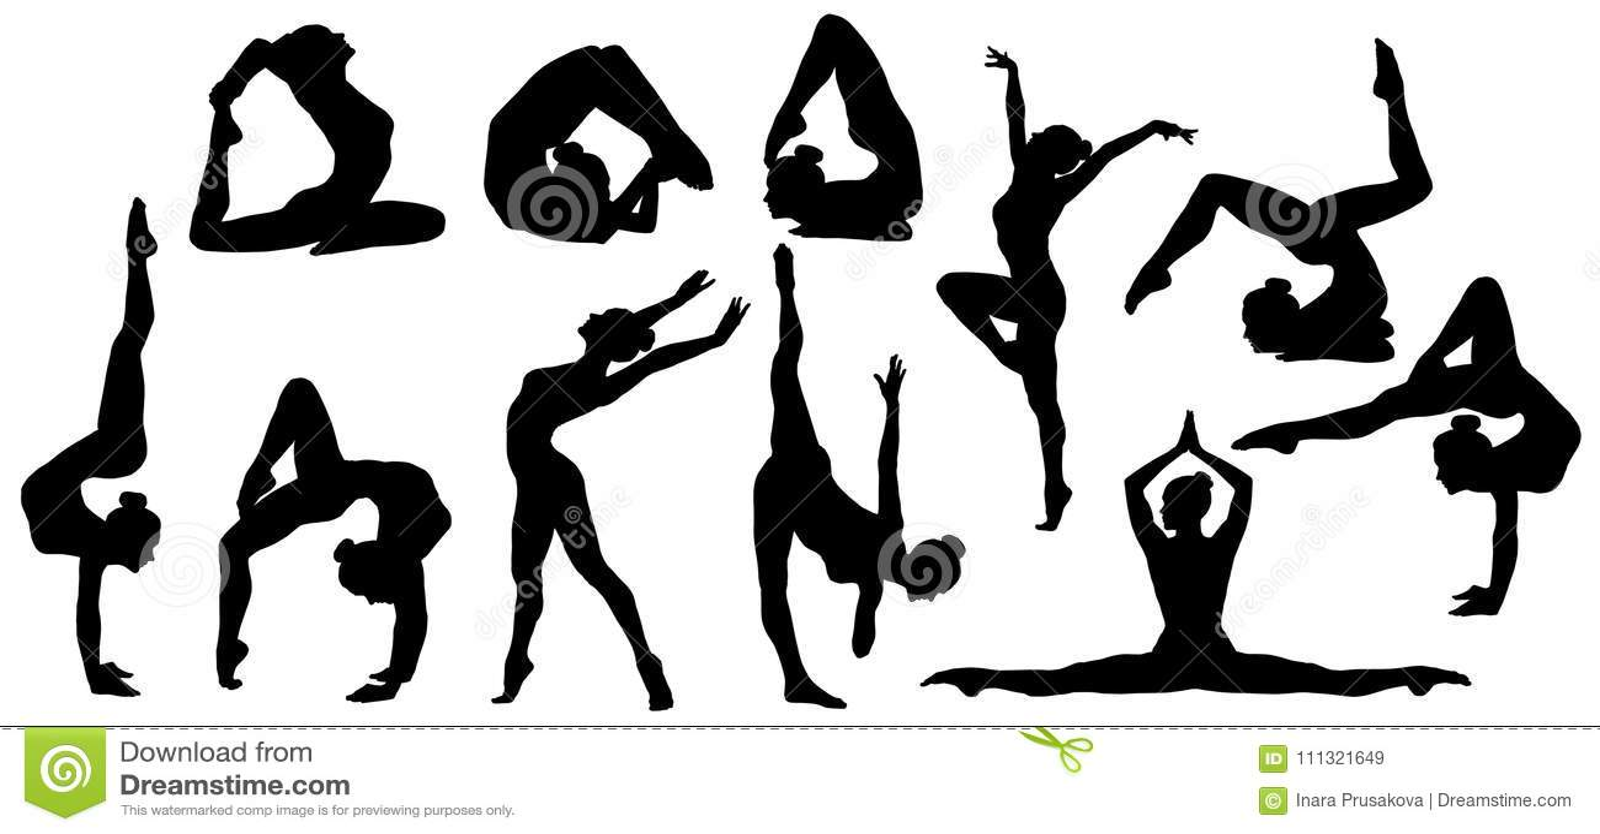 La gymnastique pose la silhouette, ensemble d exercice flexible de gymnaste